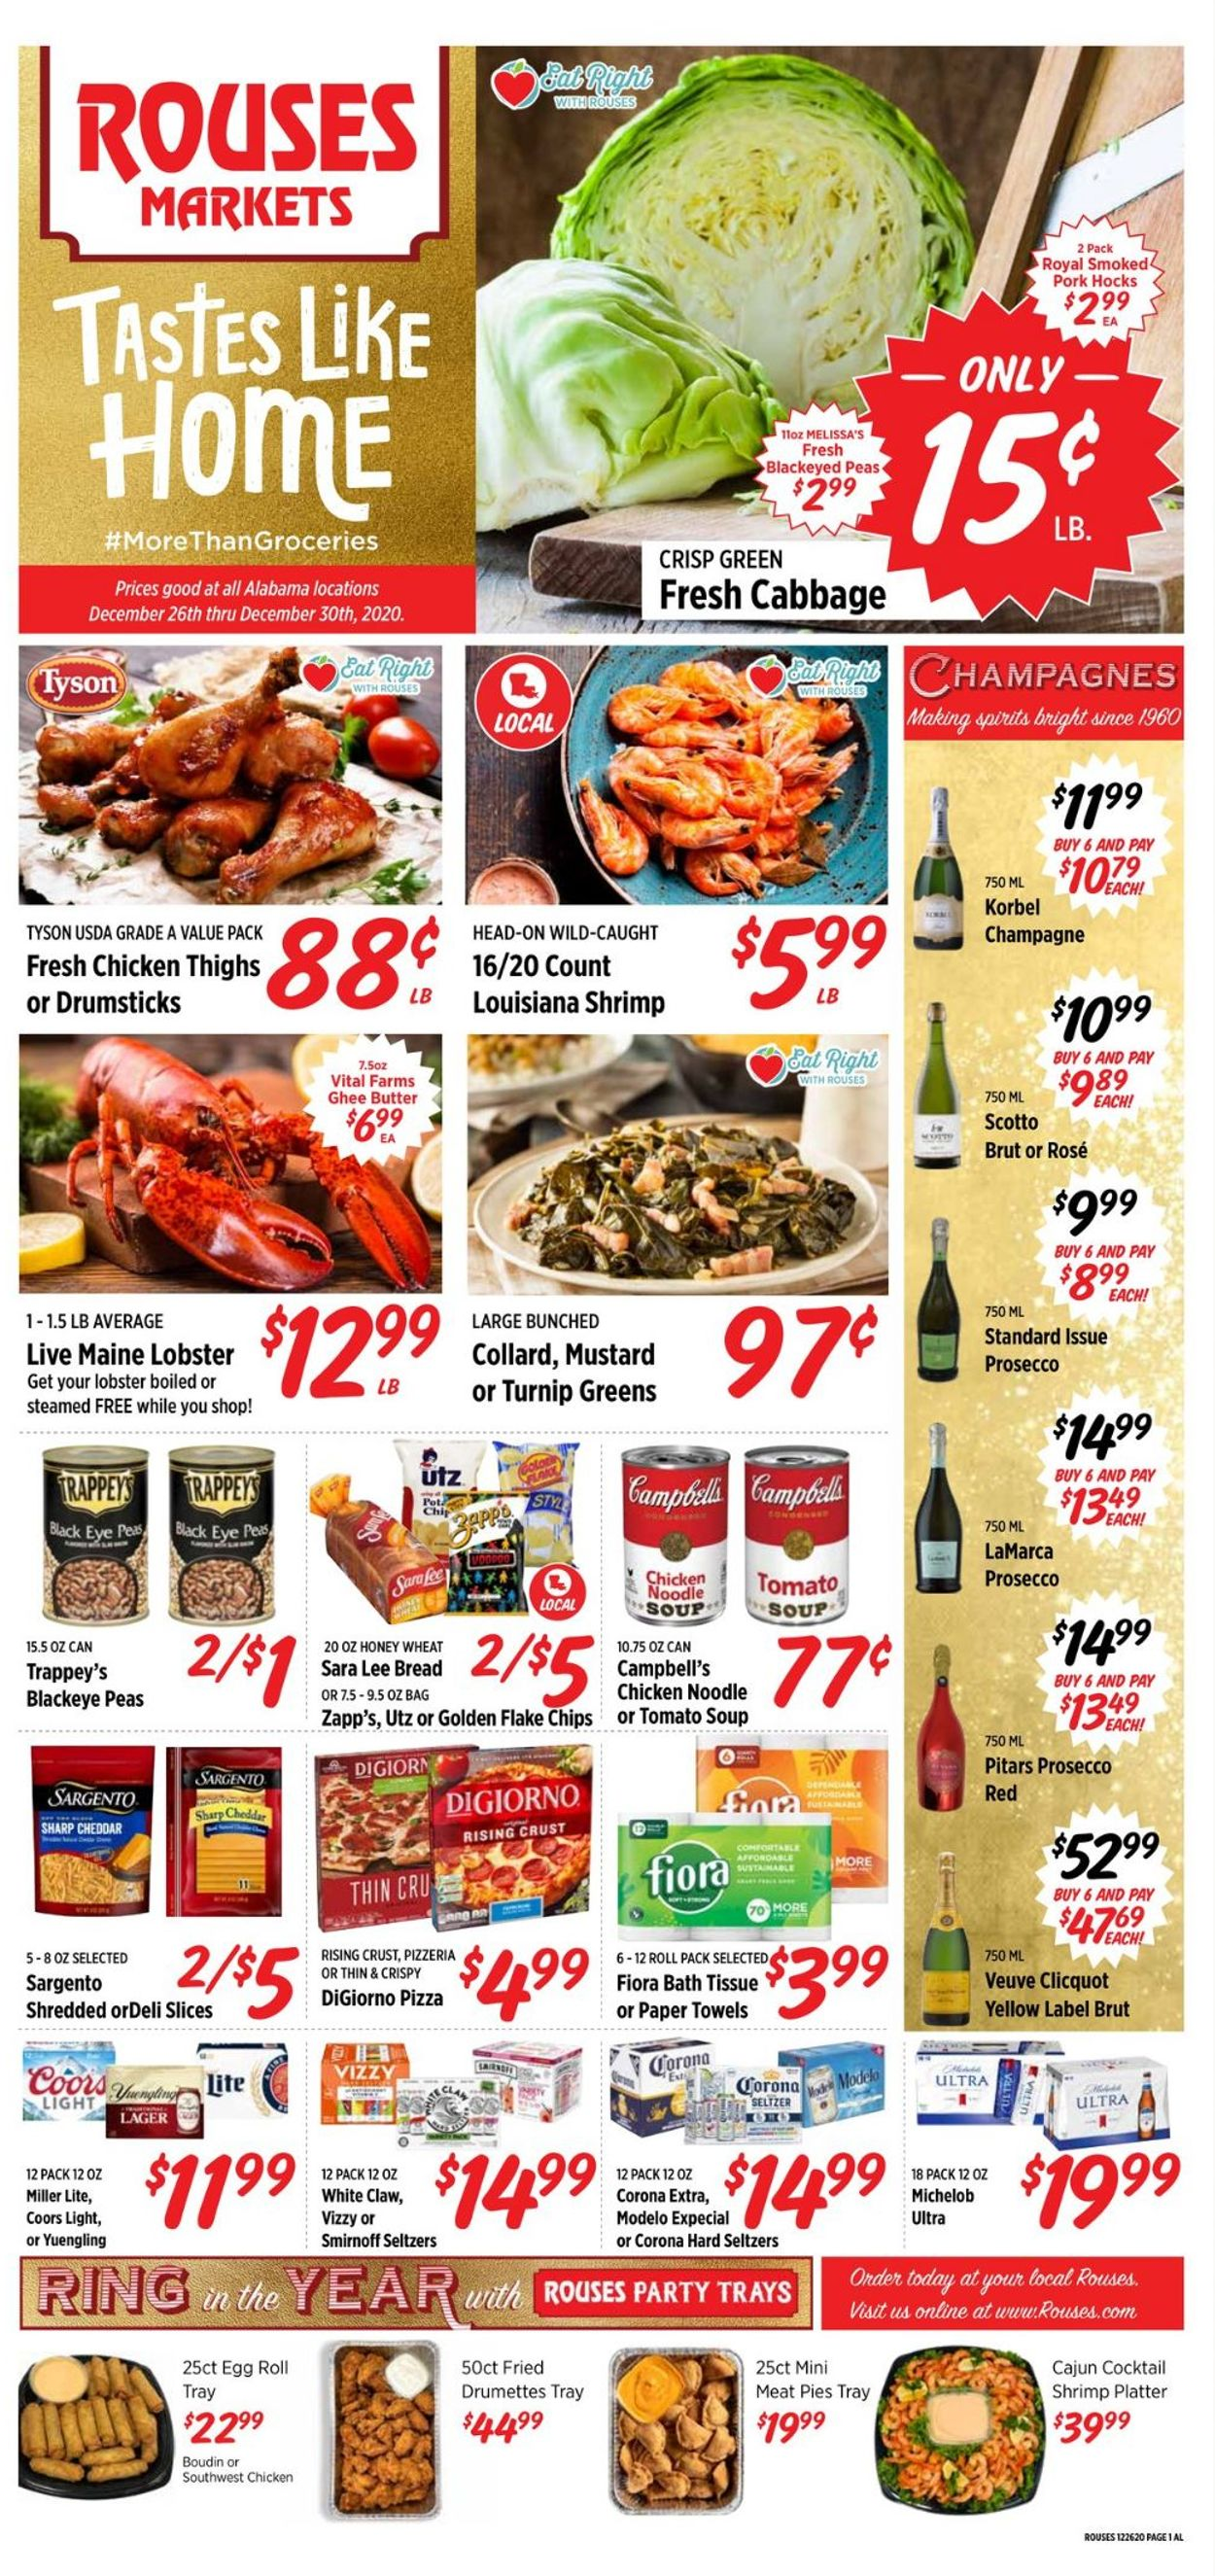 Rouses Weekly Ad Circular - valid 12/26-12/30/2020